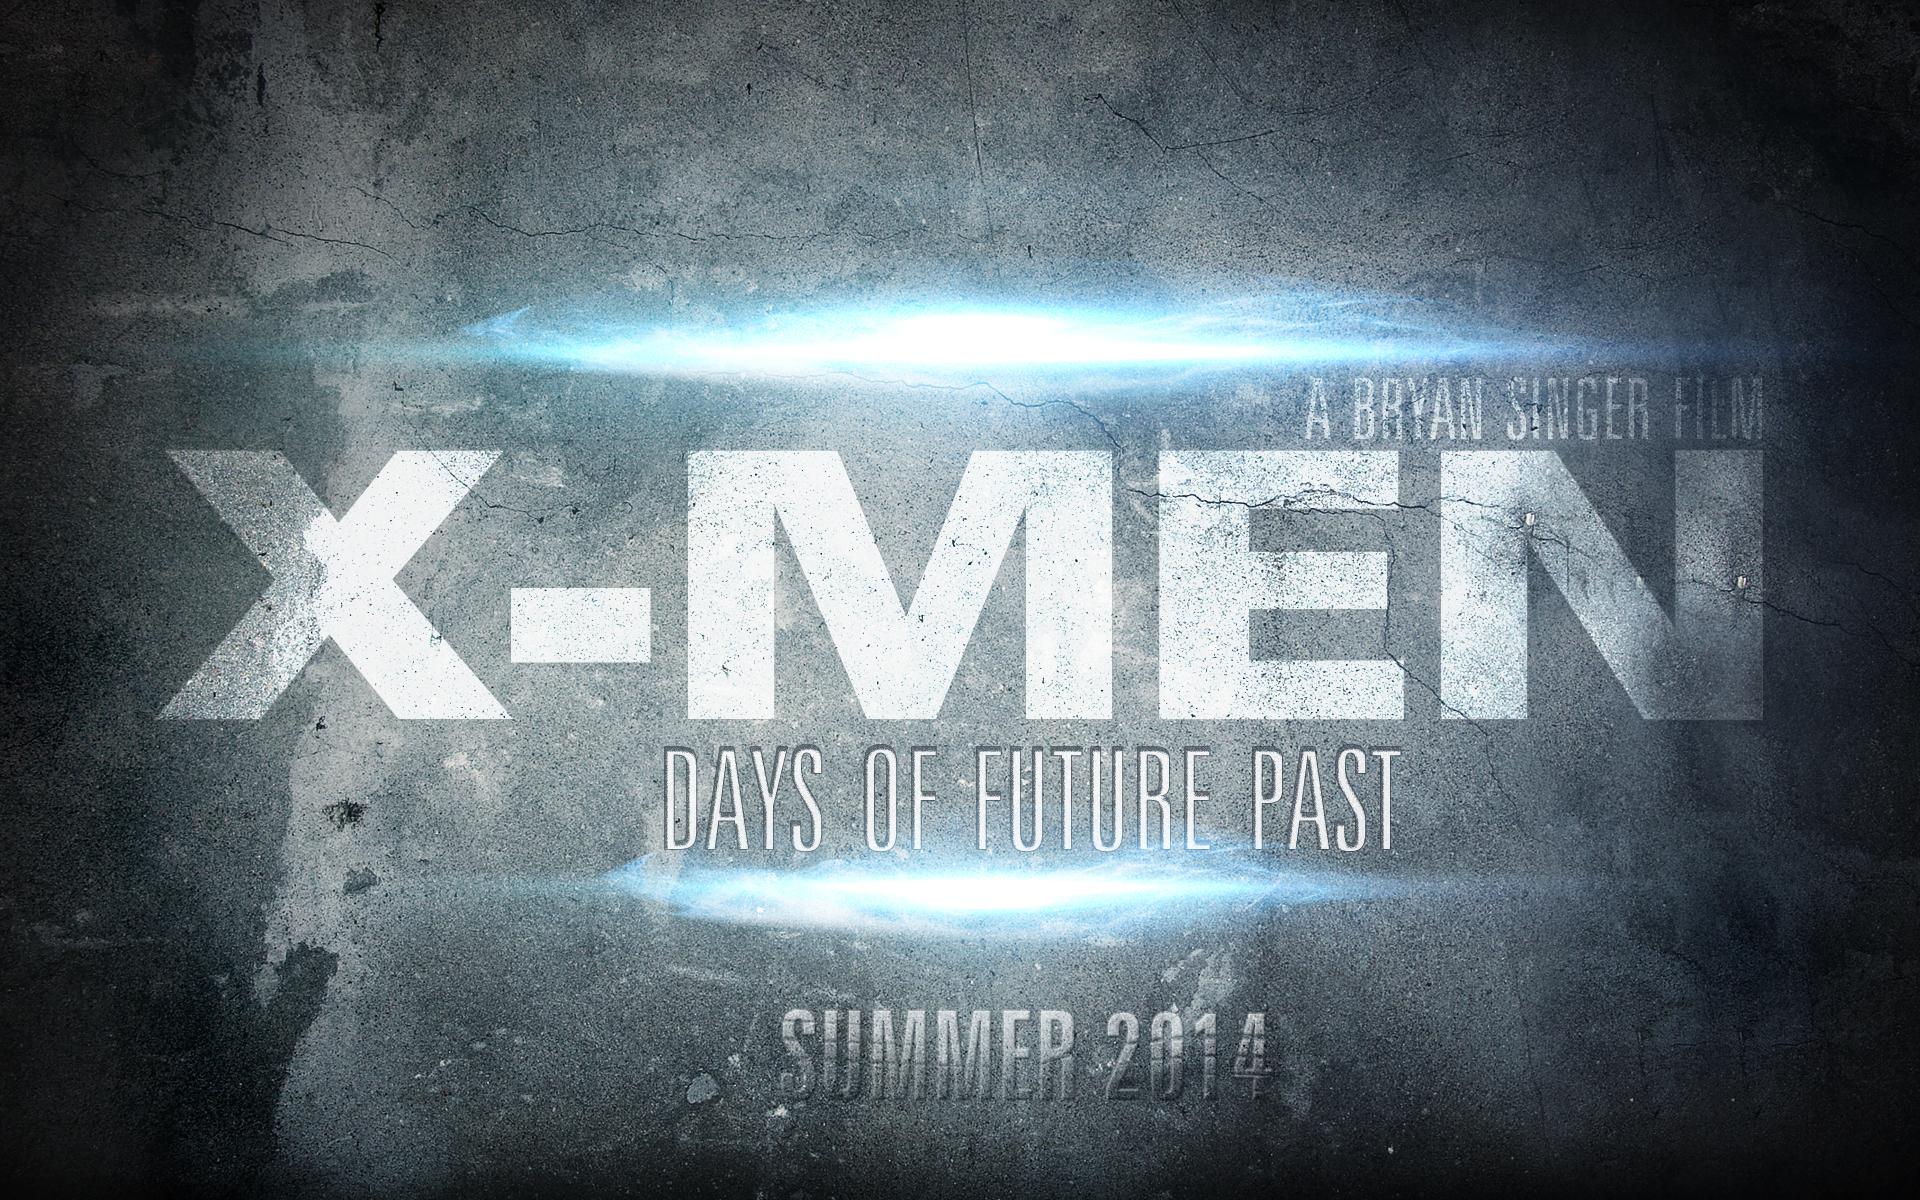 X men Days of Future Past Wallpapers   X Men Wallpaper 1920x1200